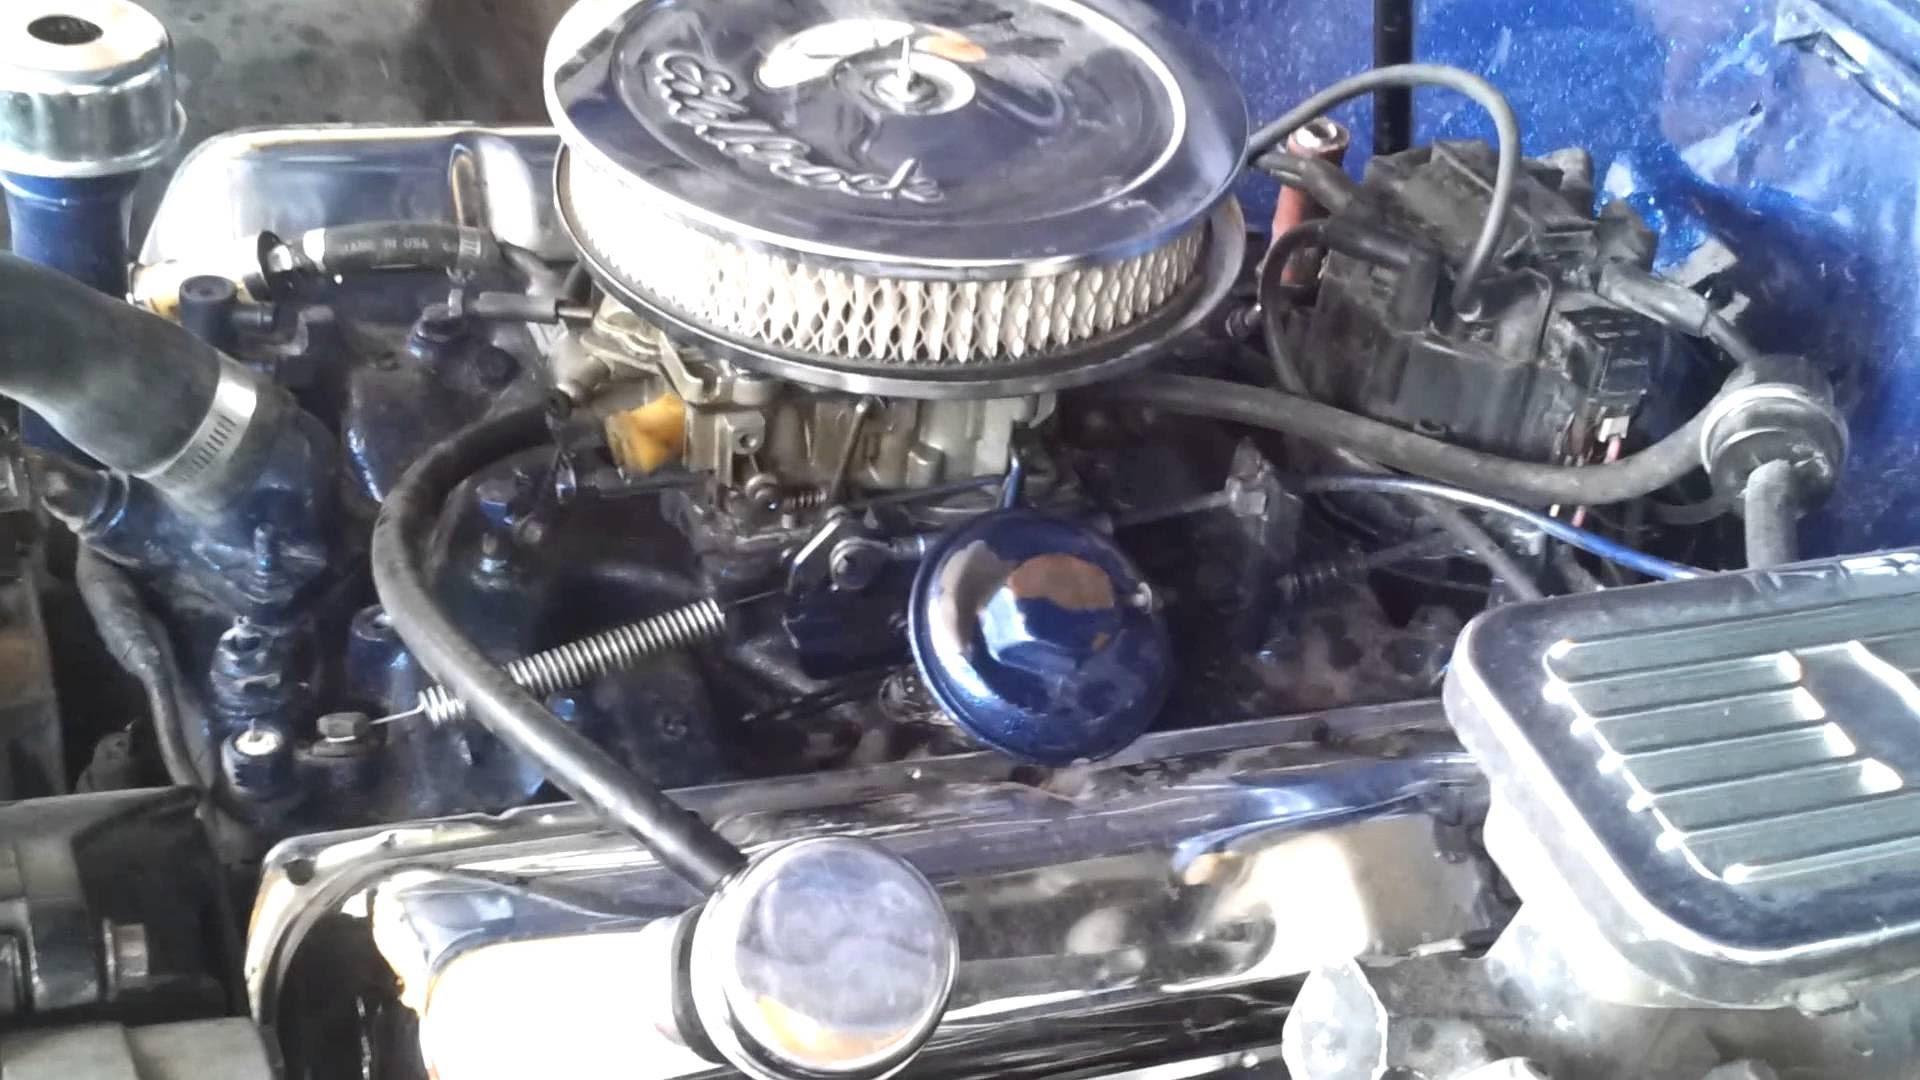 Diagram 1967 Oldsmobile Cutlass Wiring Diagram Full Version Hd Quality Wiring Diagram Soleddiagram Coursesmeredenis Fr